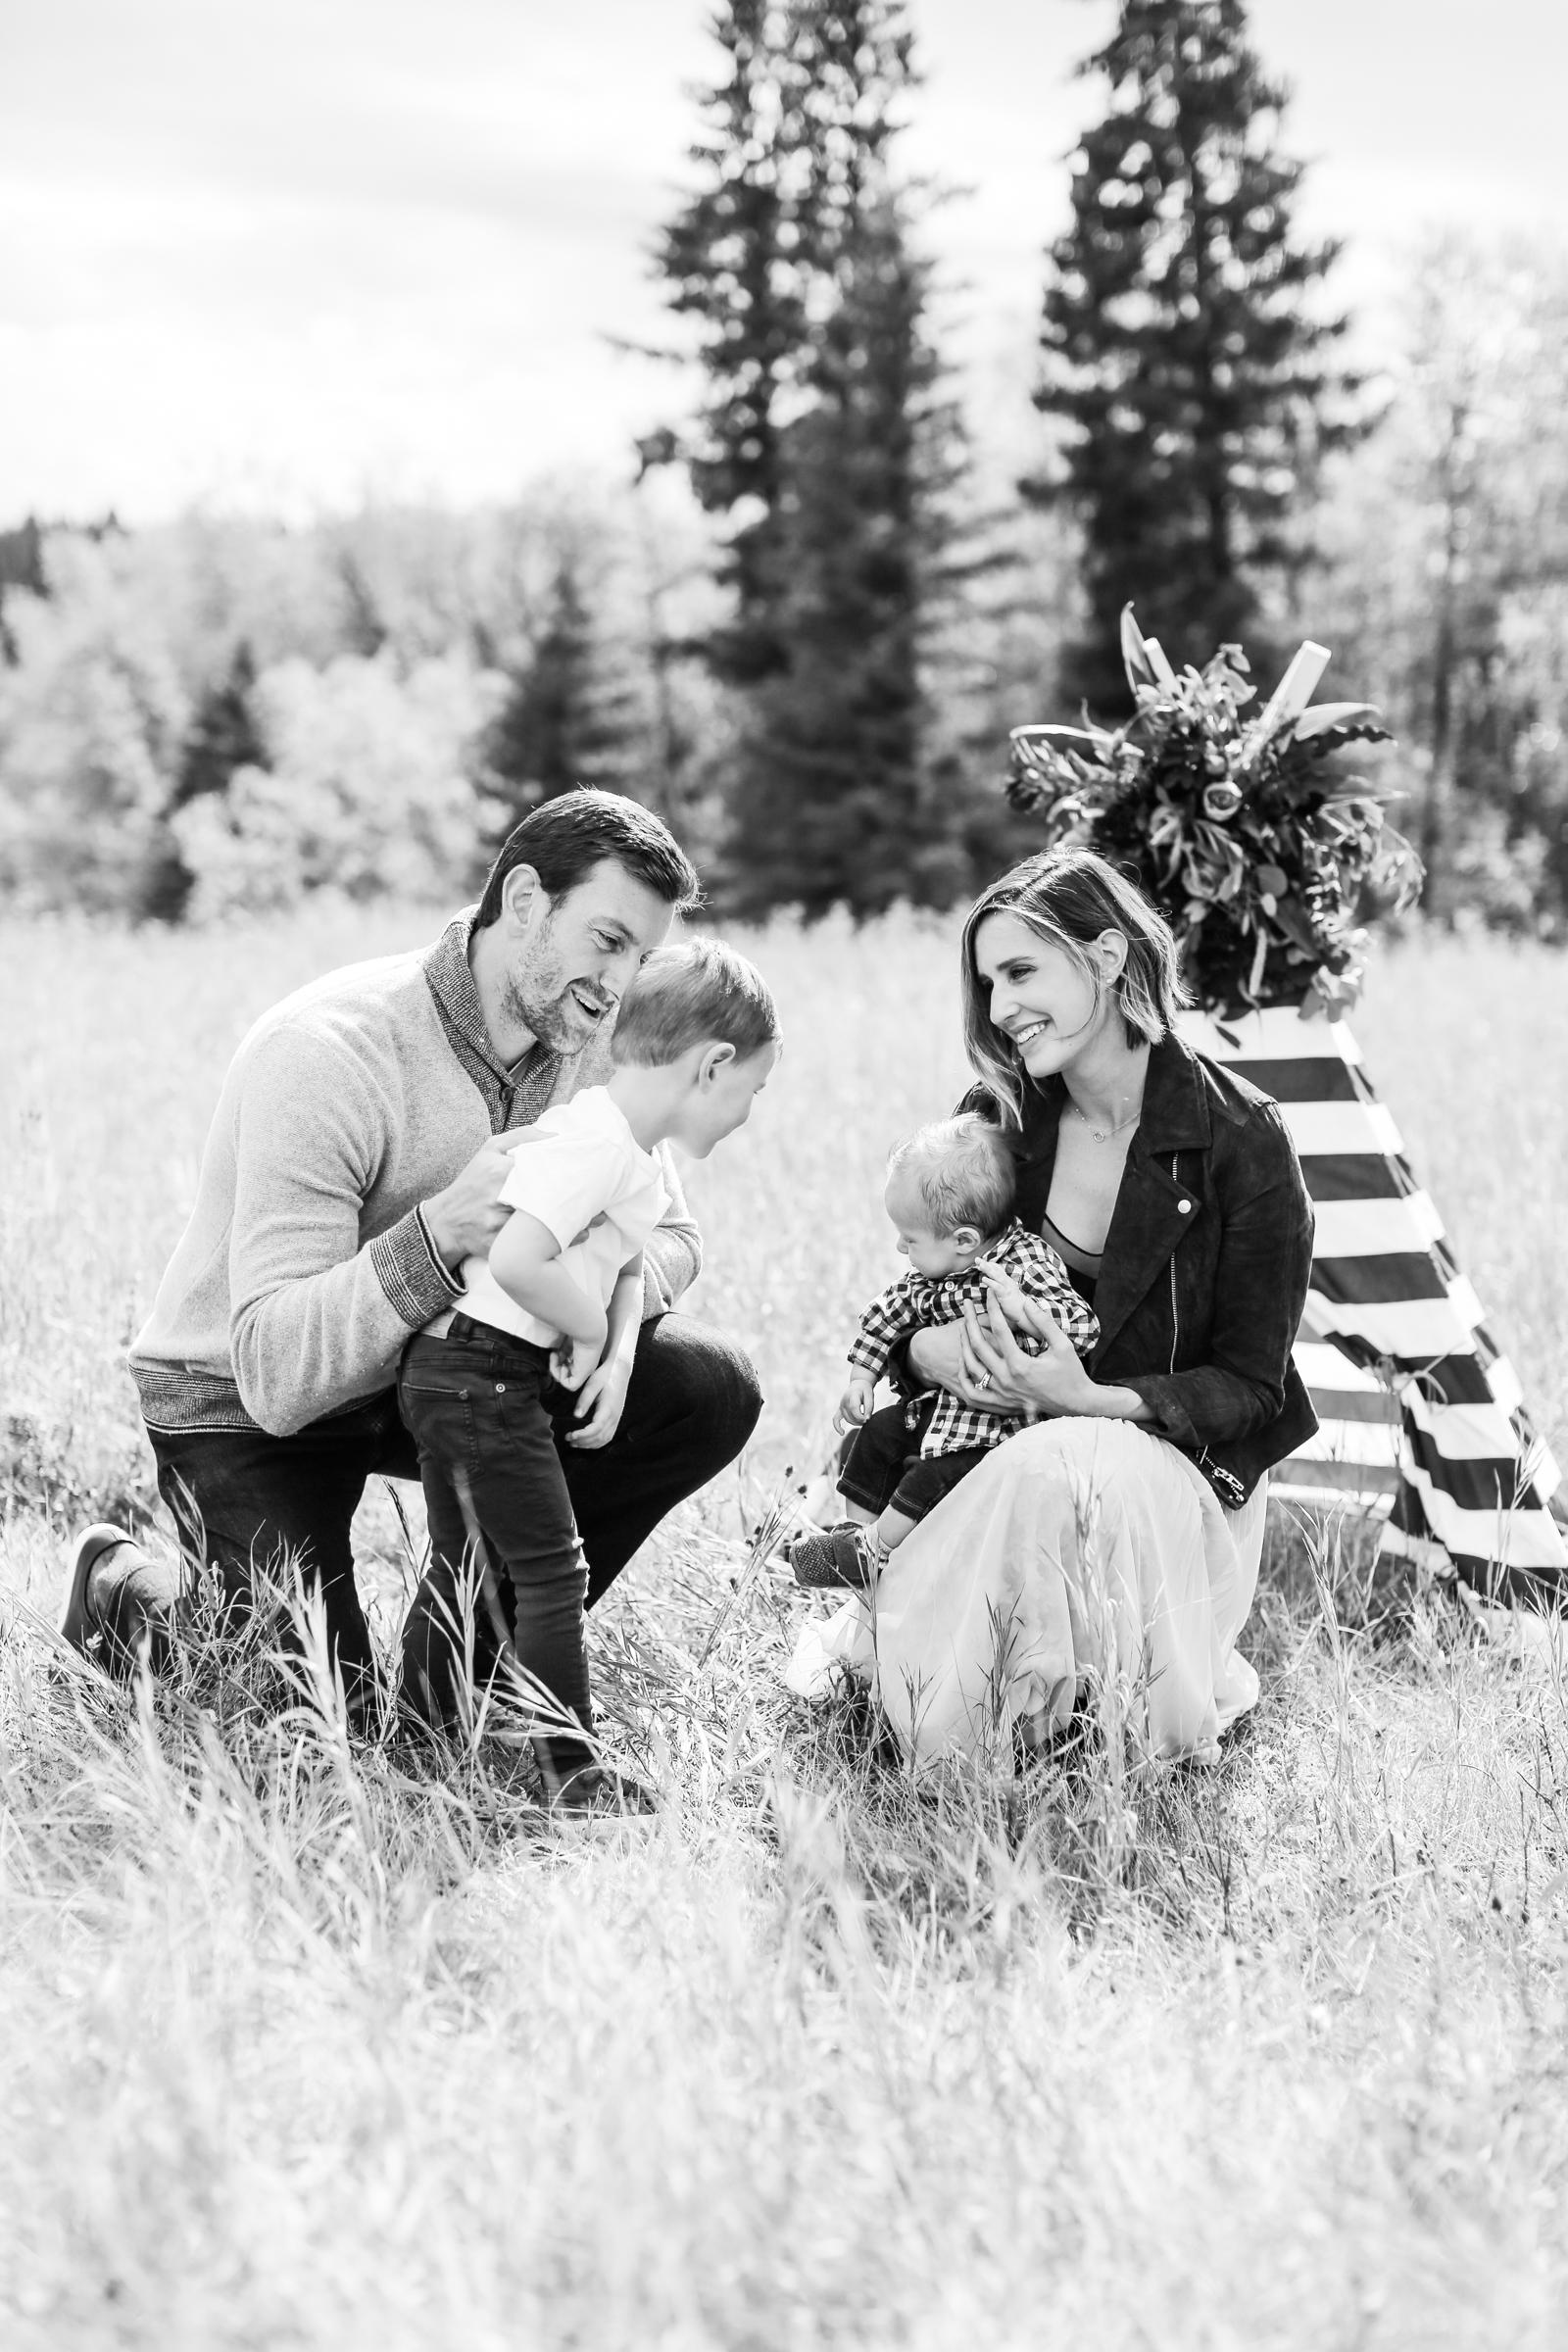 Fall-Family-Creative-Lindsay_Skeans_Photography-25.jpg